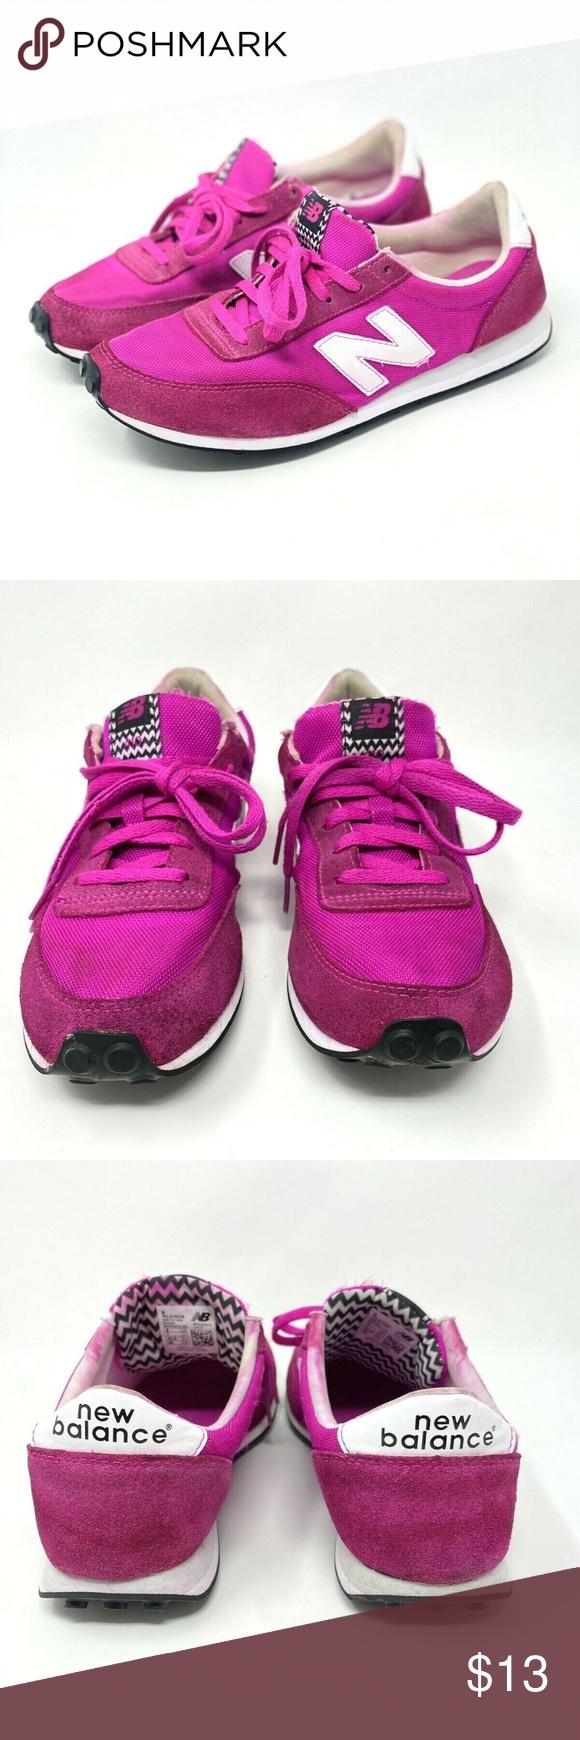 New Balance 410 WL410VIA Pink Sneakers